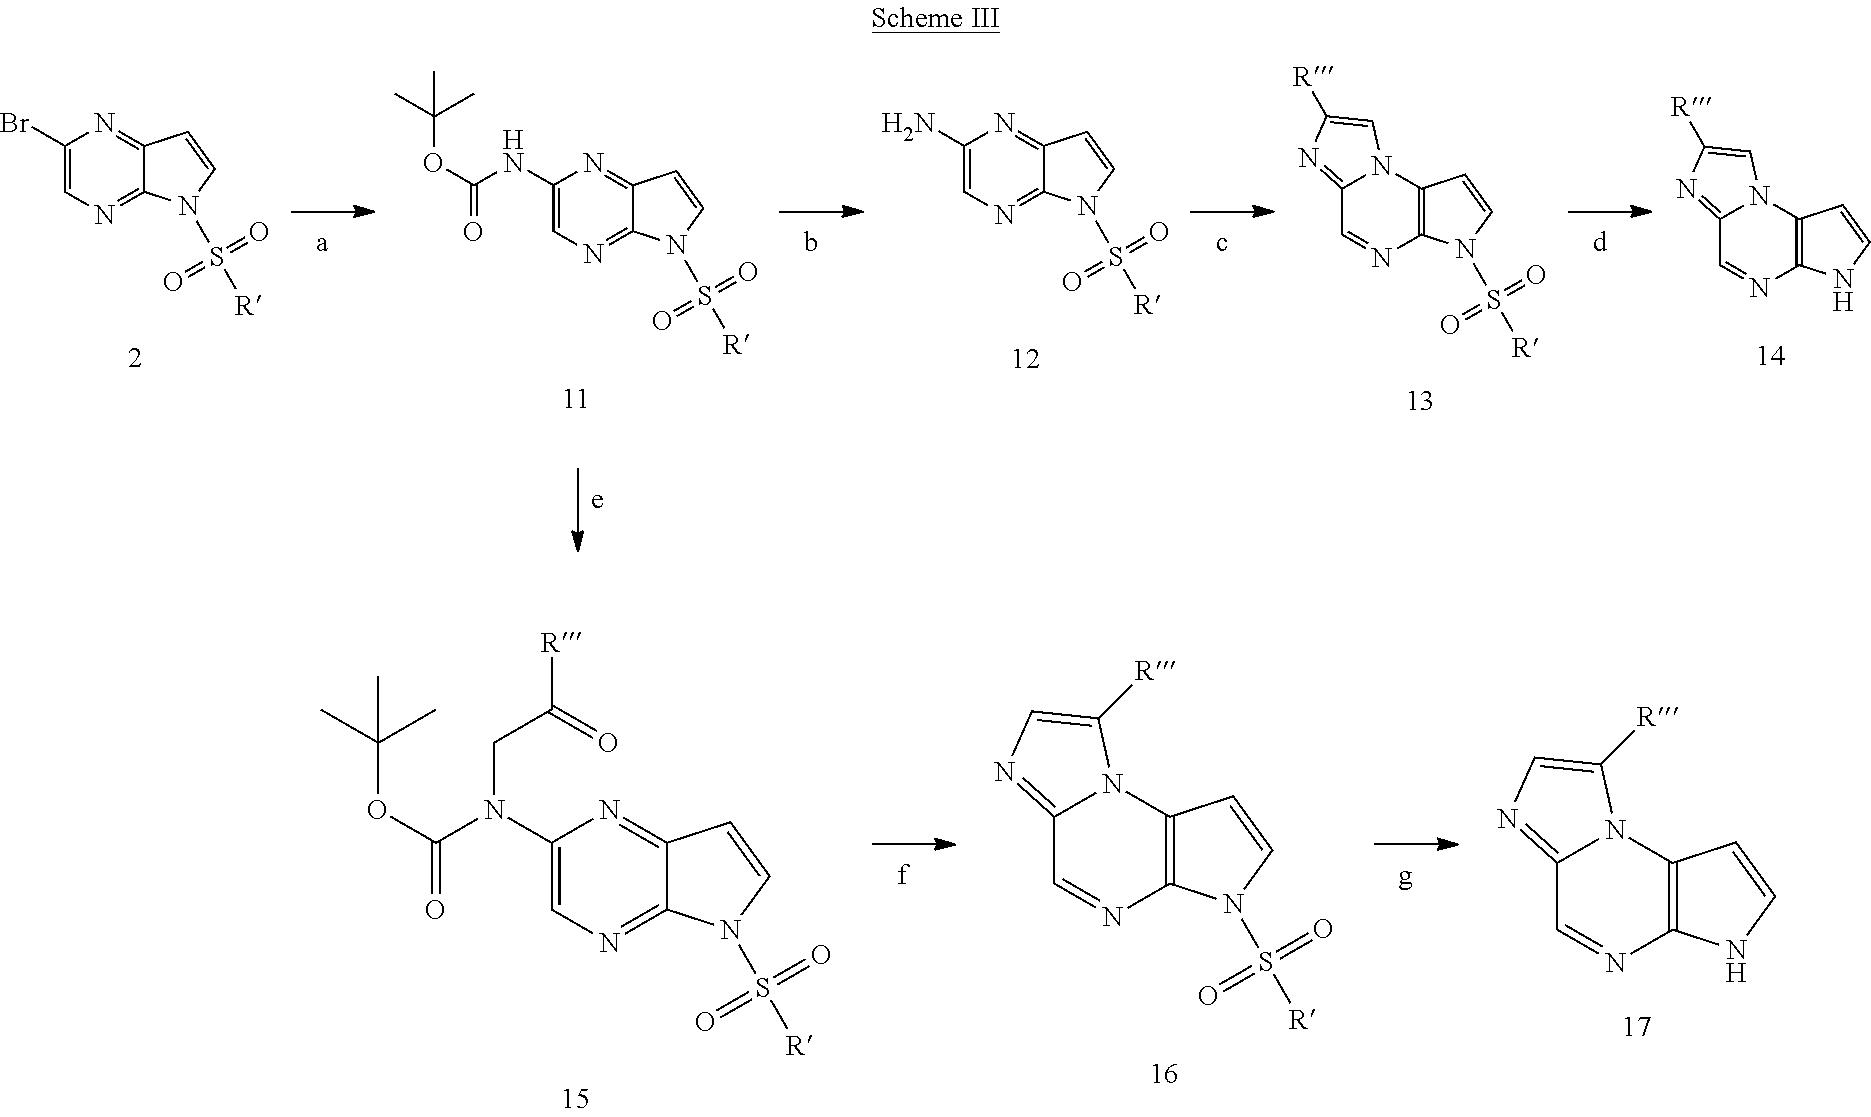 US20160326181A1 - Novel tricyclic compounds - Google Patents